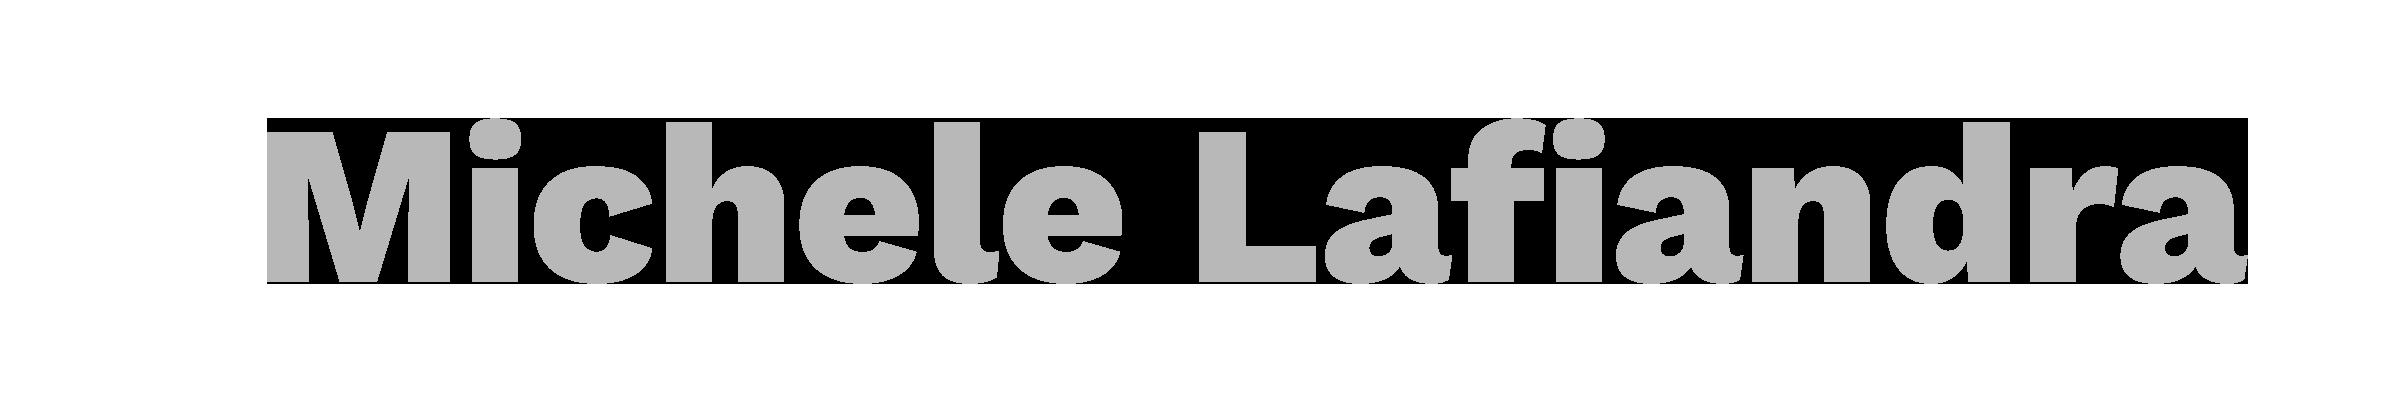 Logo Michele Lafiandra grey